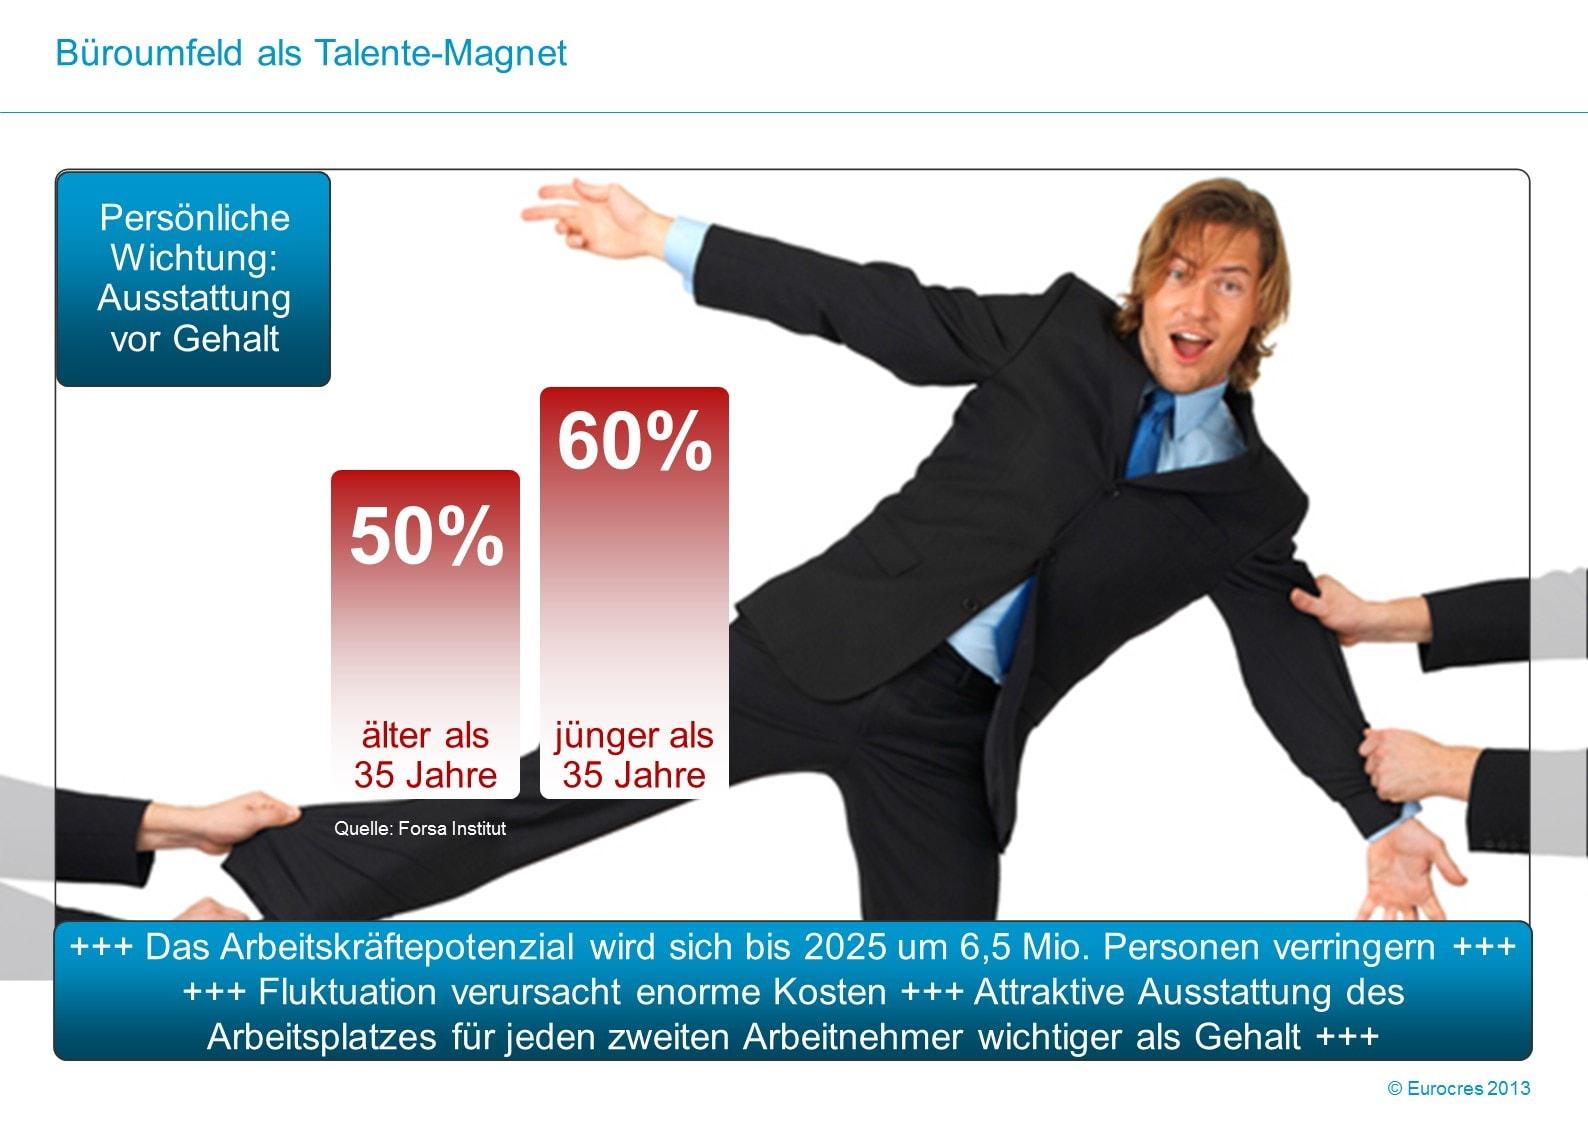 WorkPlace Flash: Büroumfeld als Talente-Magnet